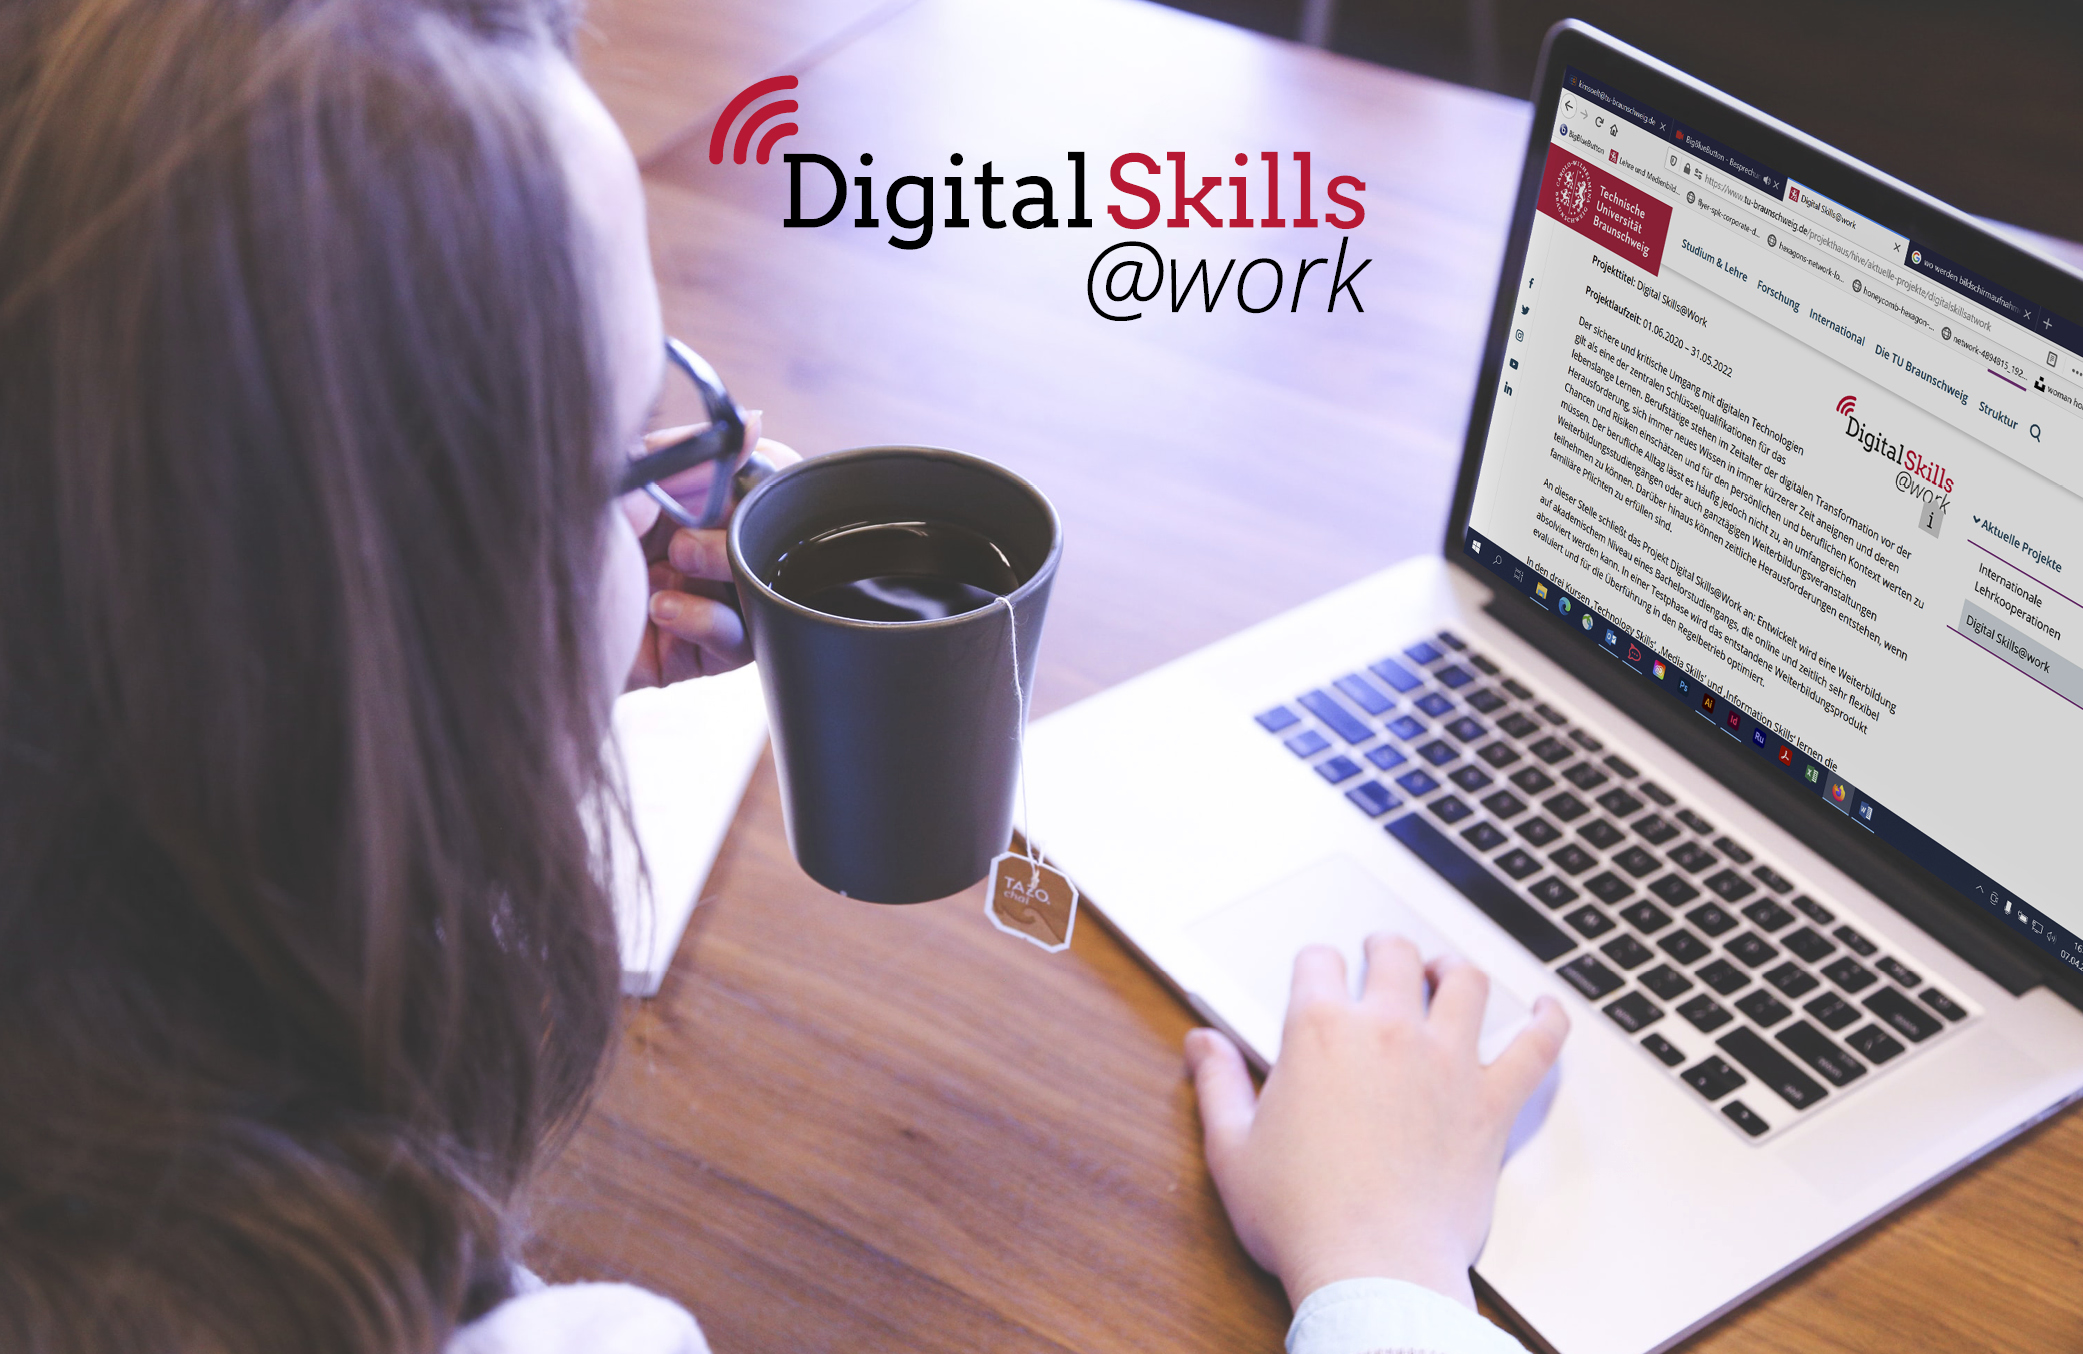 Digital Skills @work